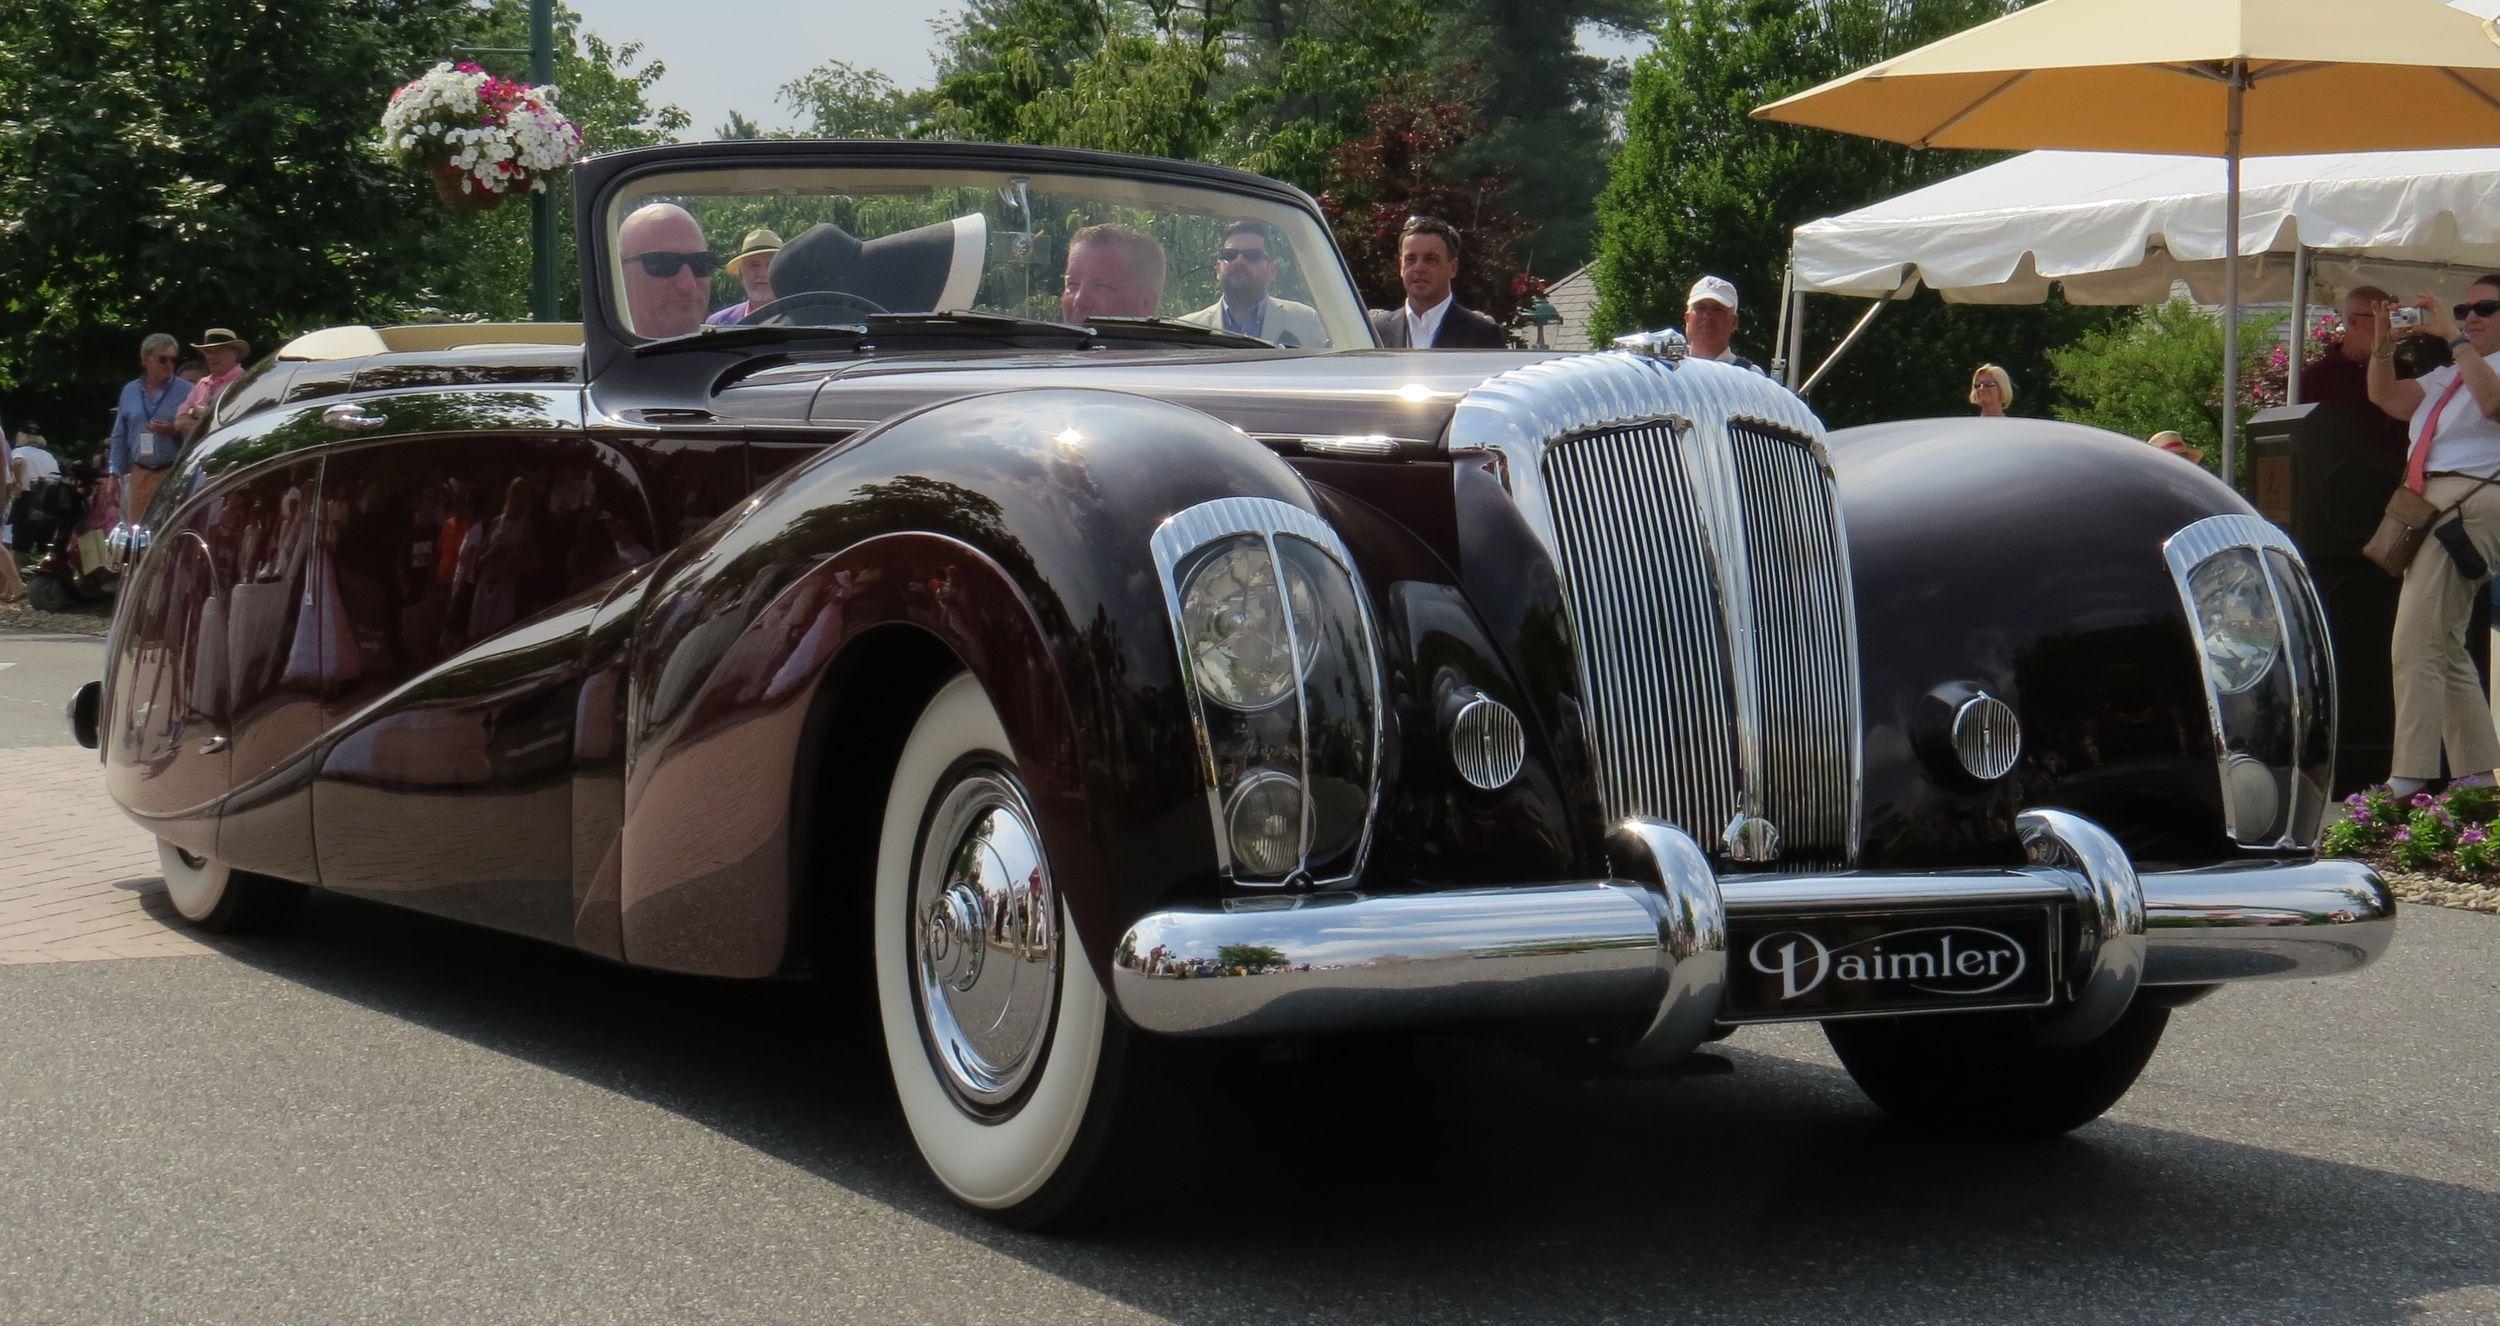 1948 Daimler DE-36 \'Green Goddess\' takes Best | Green goddess, Cars ...